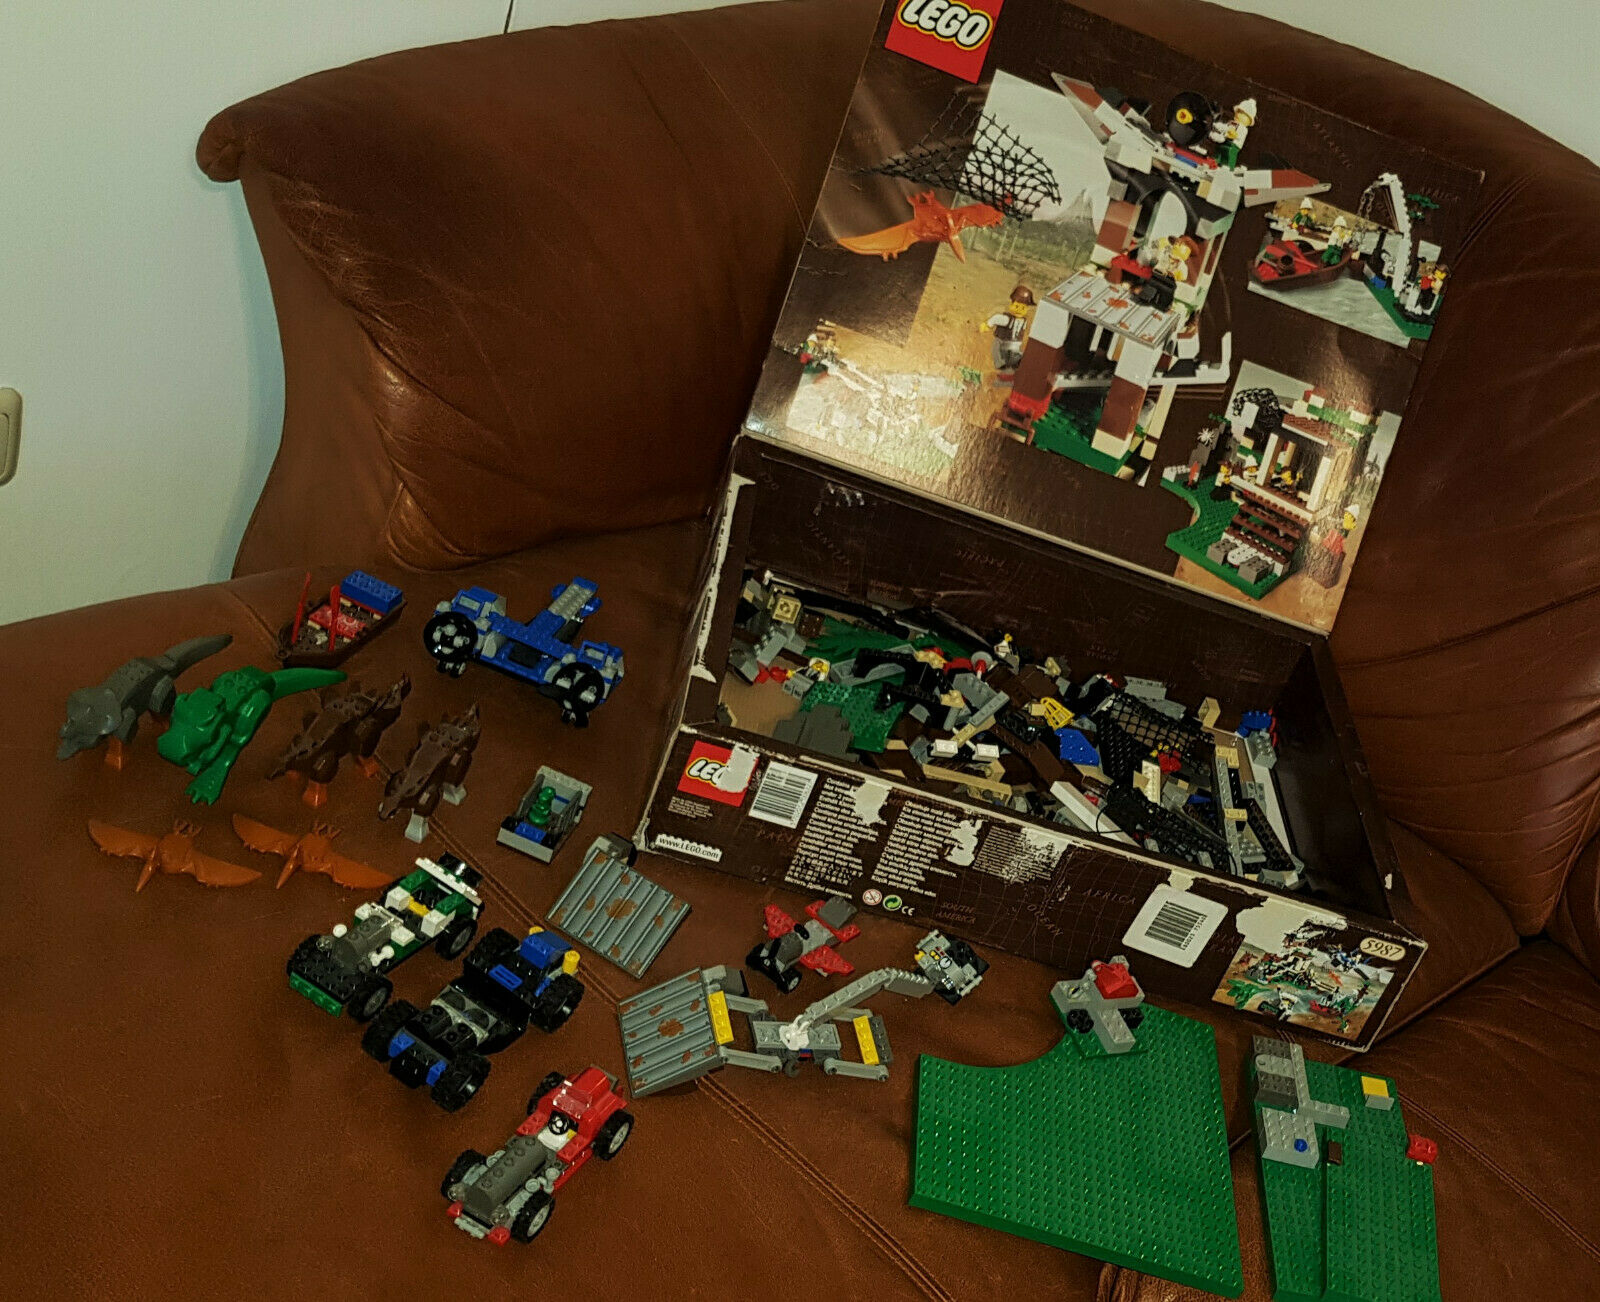 Lego 5987 Adventures Dino Forschungsstation Welt Konvolut mit vielen Anleitungen